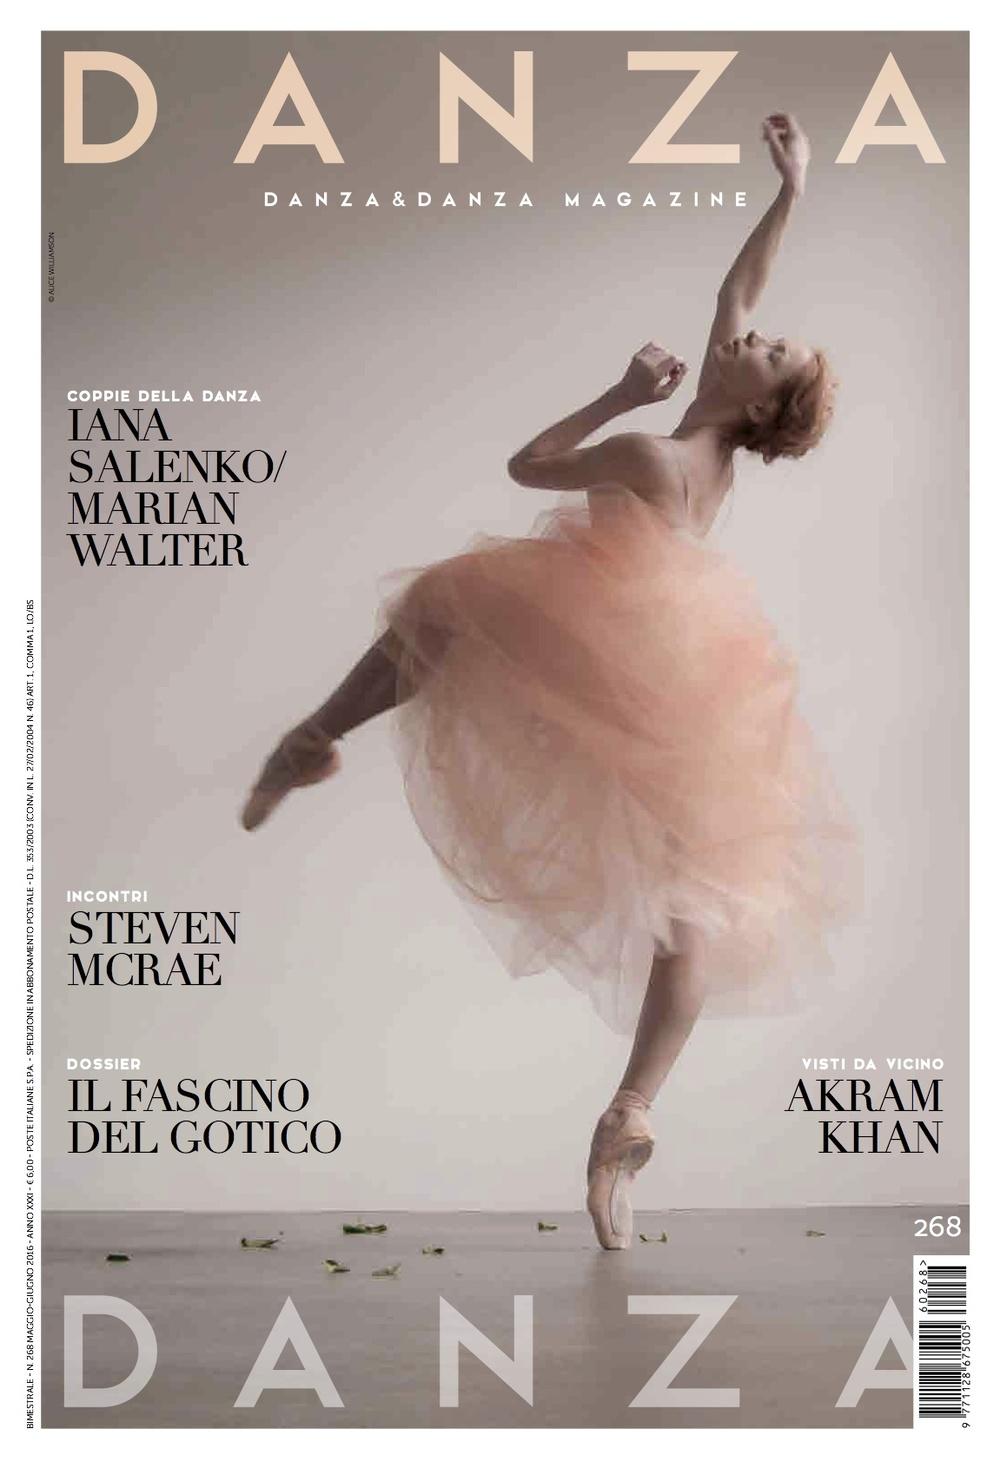 Danza&Danza Magazine May 2016 Cover.jpg